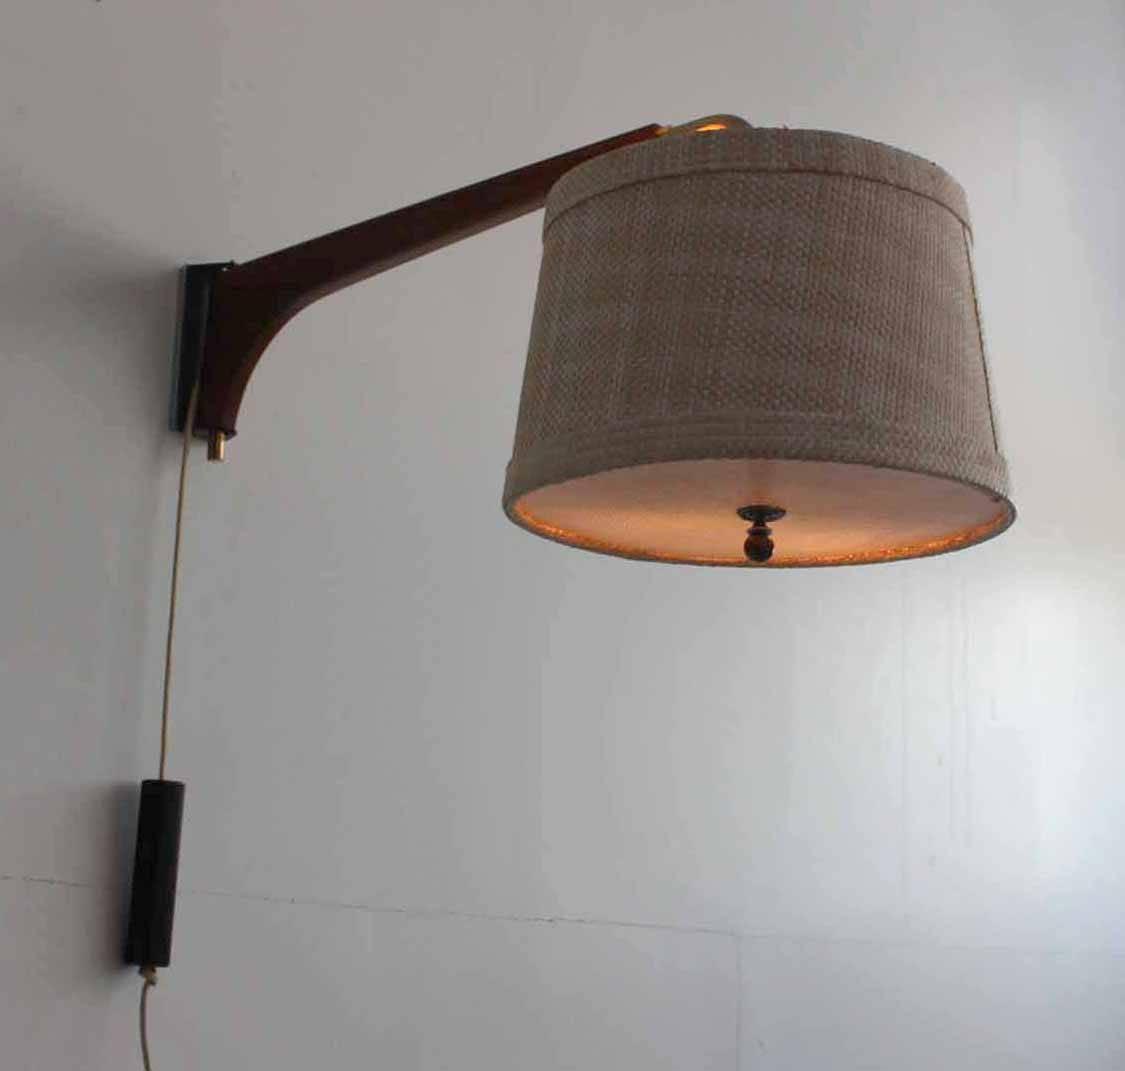 Modern Adjustable Wall Lights : Danish Modern Adjustable Wall Scones For Sale at 1stdibs